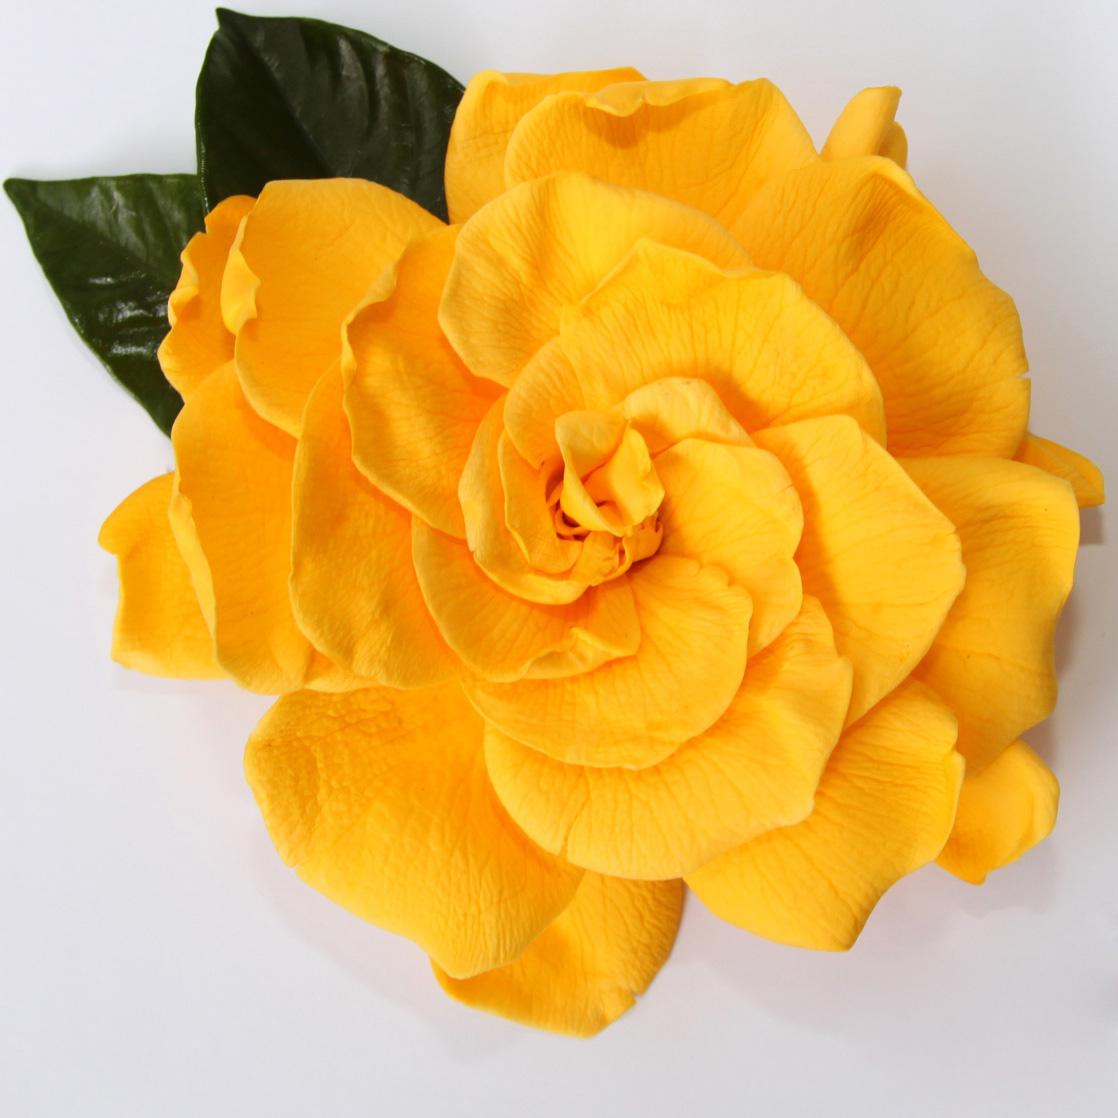 gardenia-verdissimo